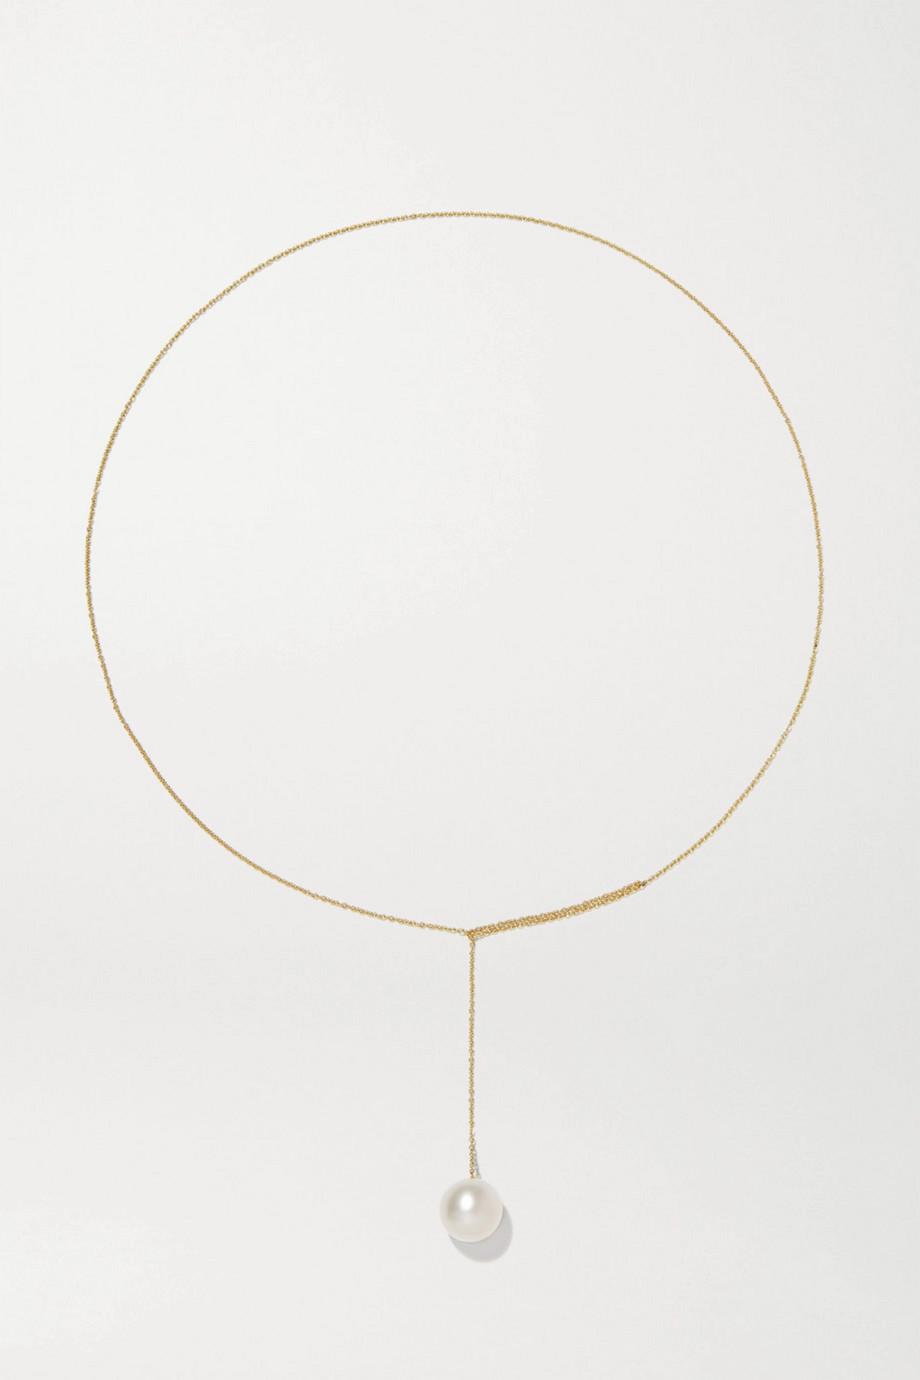 Sophie Bille Brahe Sirene Perle 14-karat gold pearl necklace